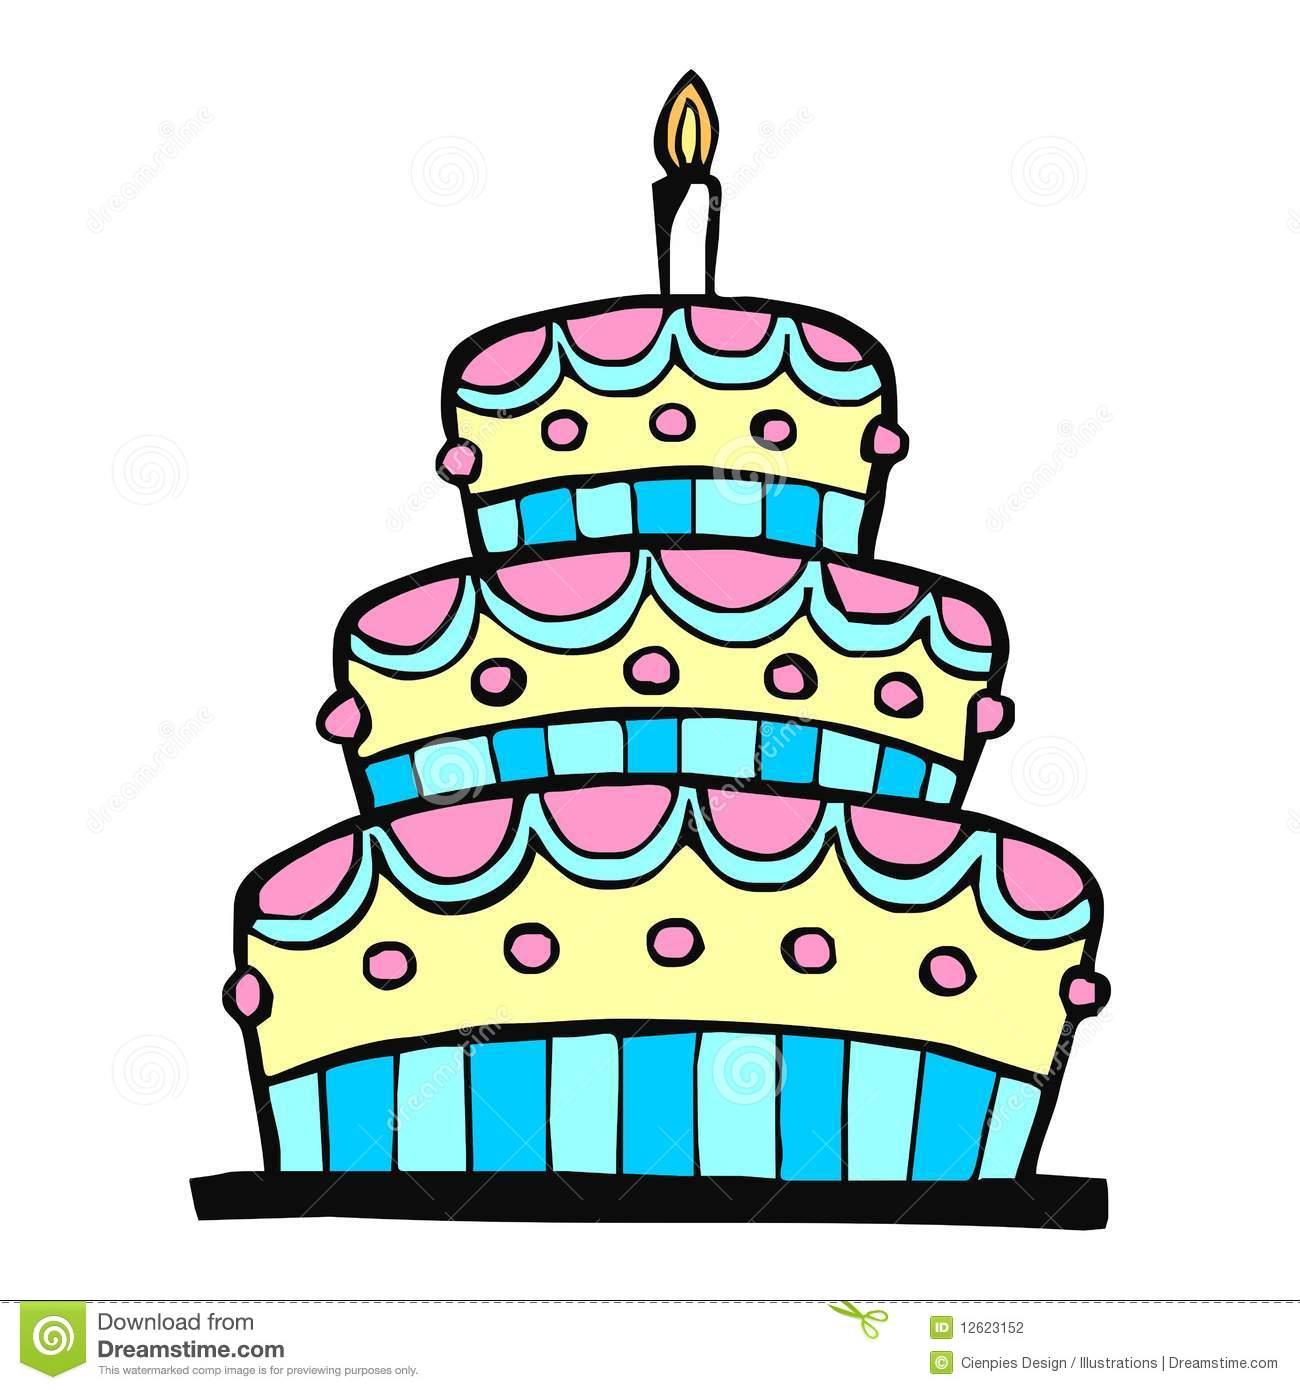 Wedding Cake Clip Art images